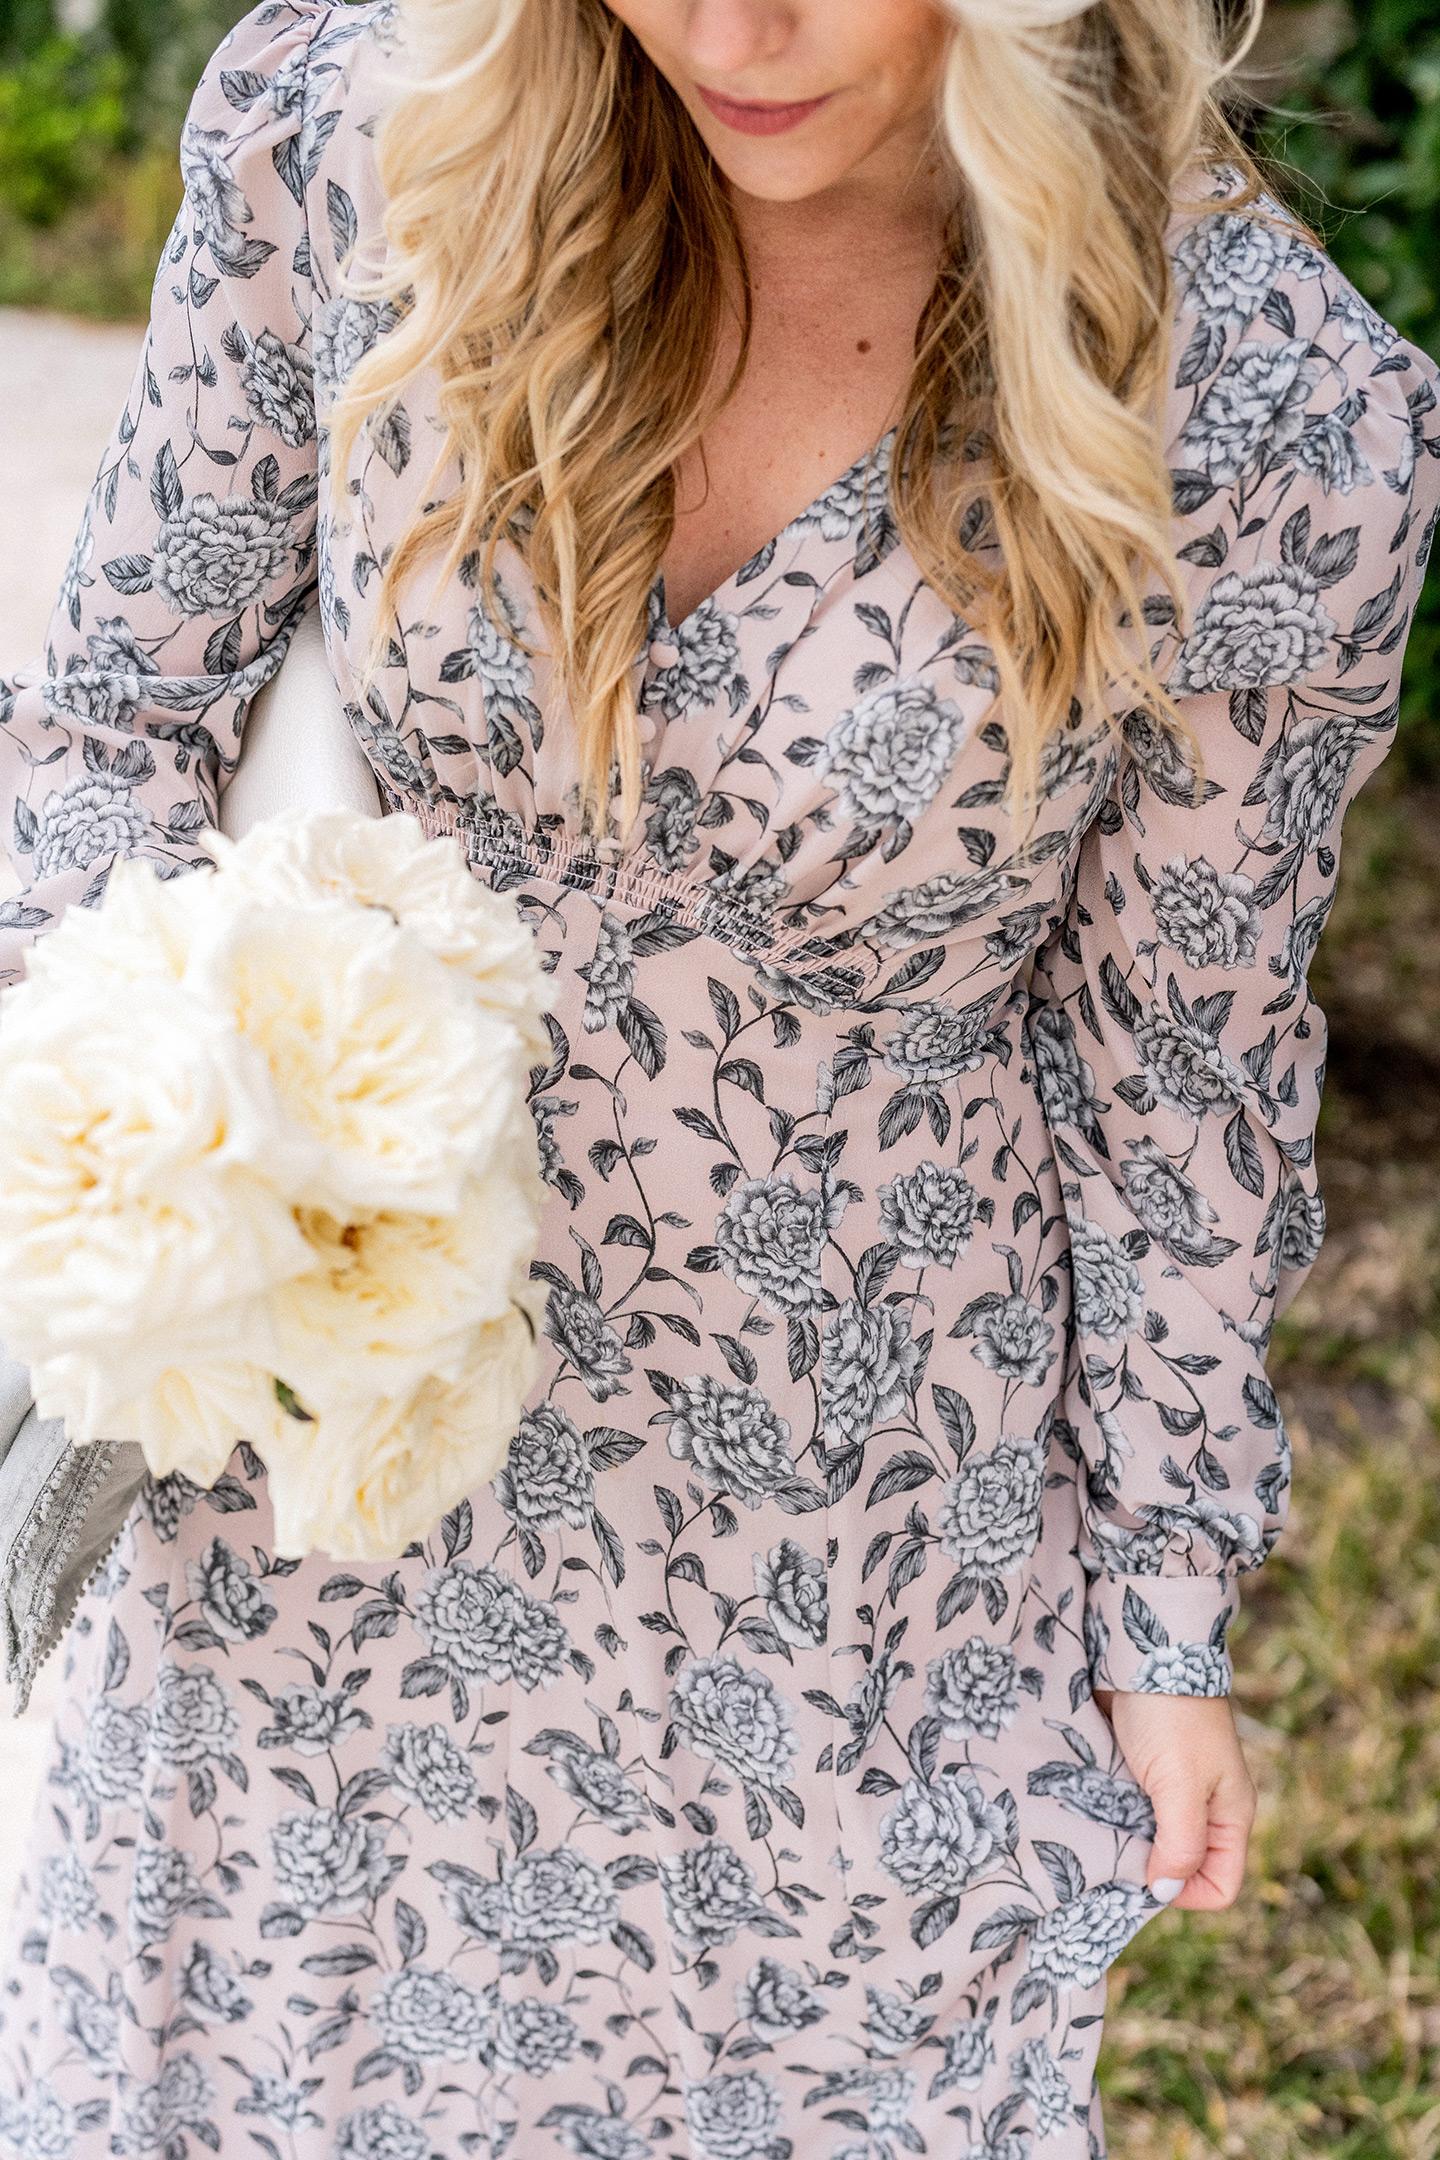 Winter Floral Fashion Dress